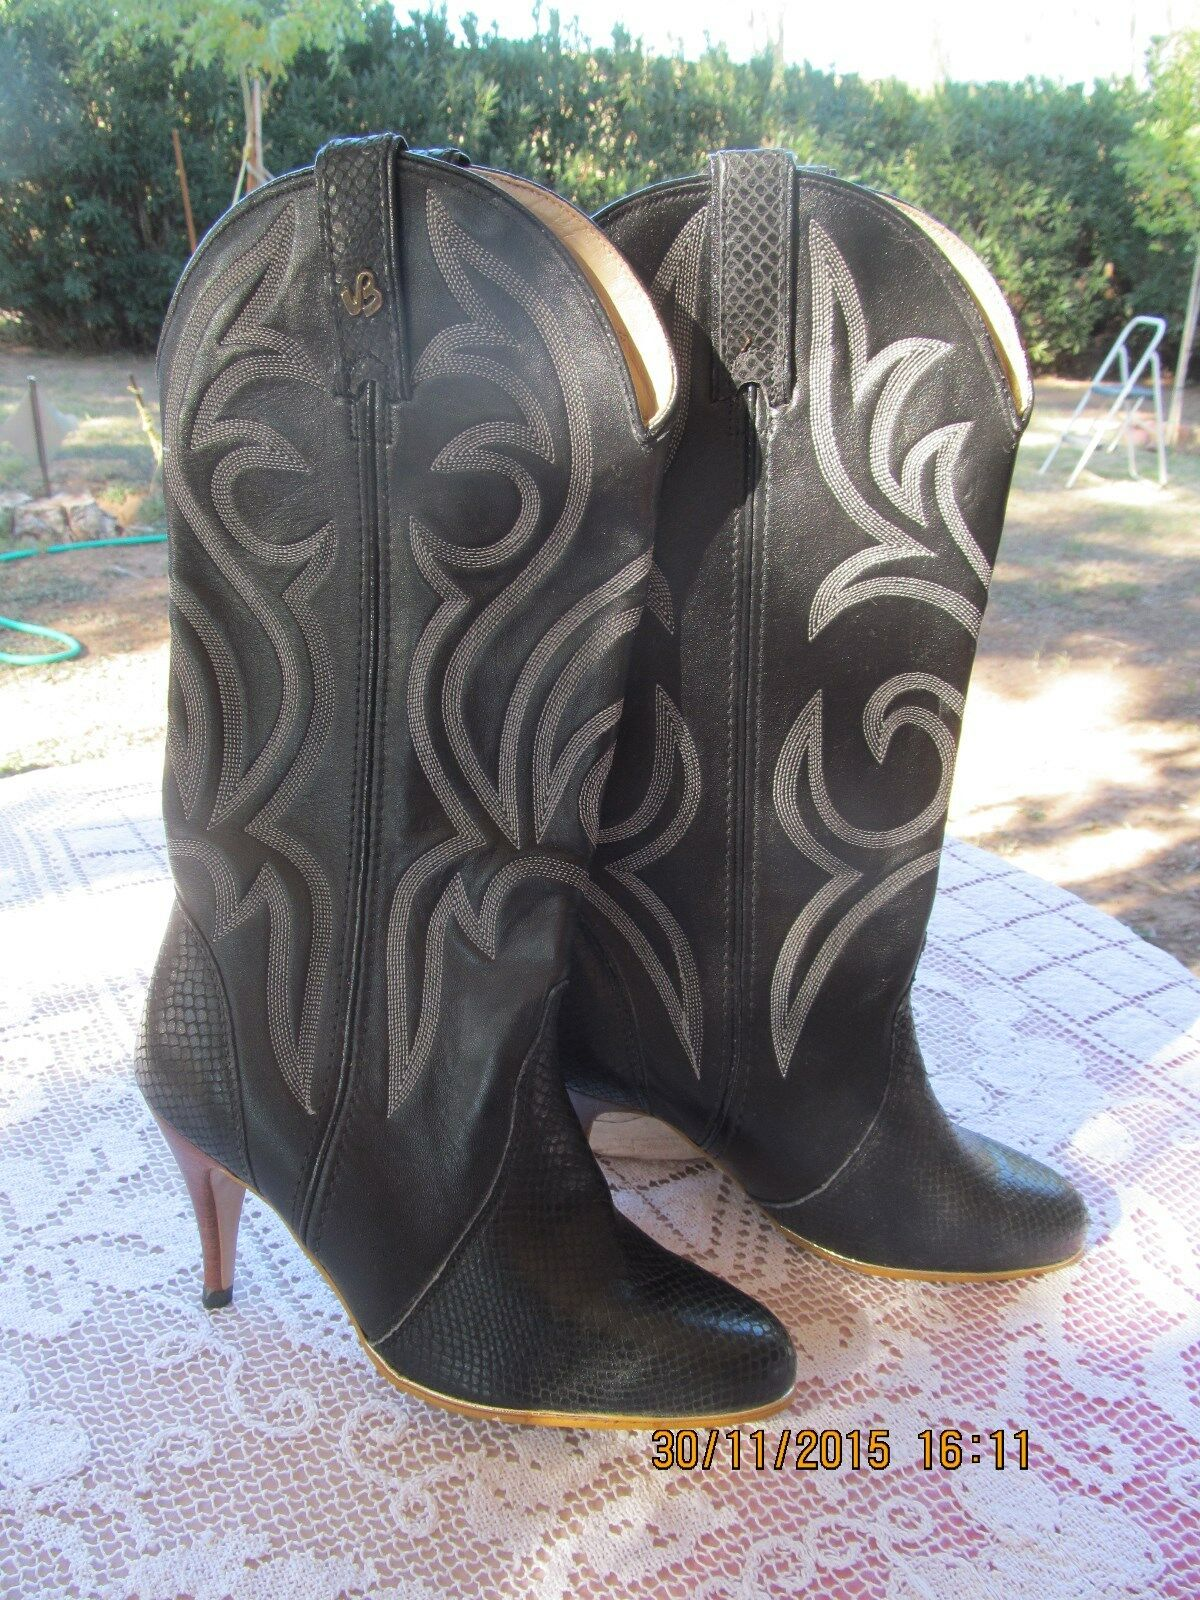 Damens's M VINTAGE JEENZ BOOTZ Stiefel COWBOY BLACK LEATHER 7.5 M Damens's USA WESTERN 3 1/2